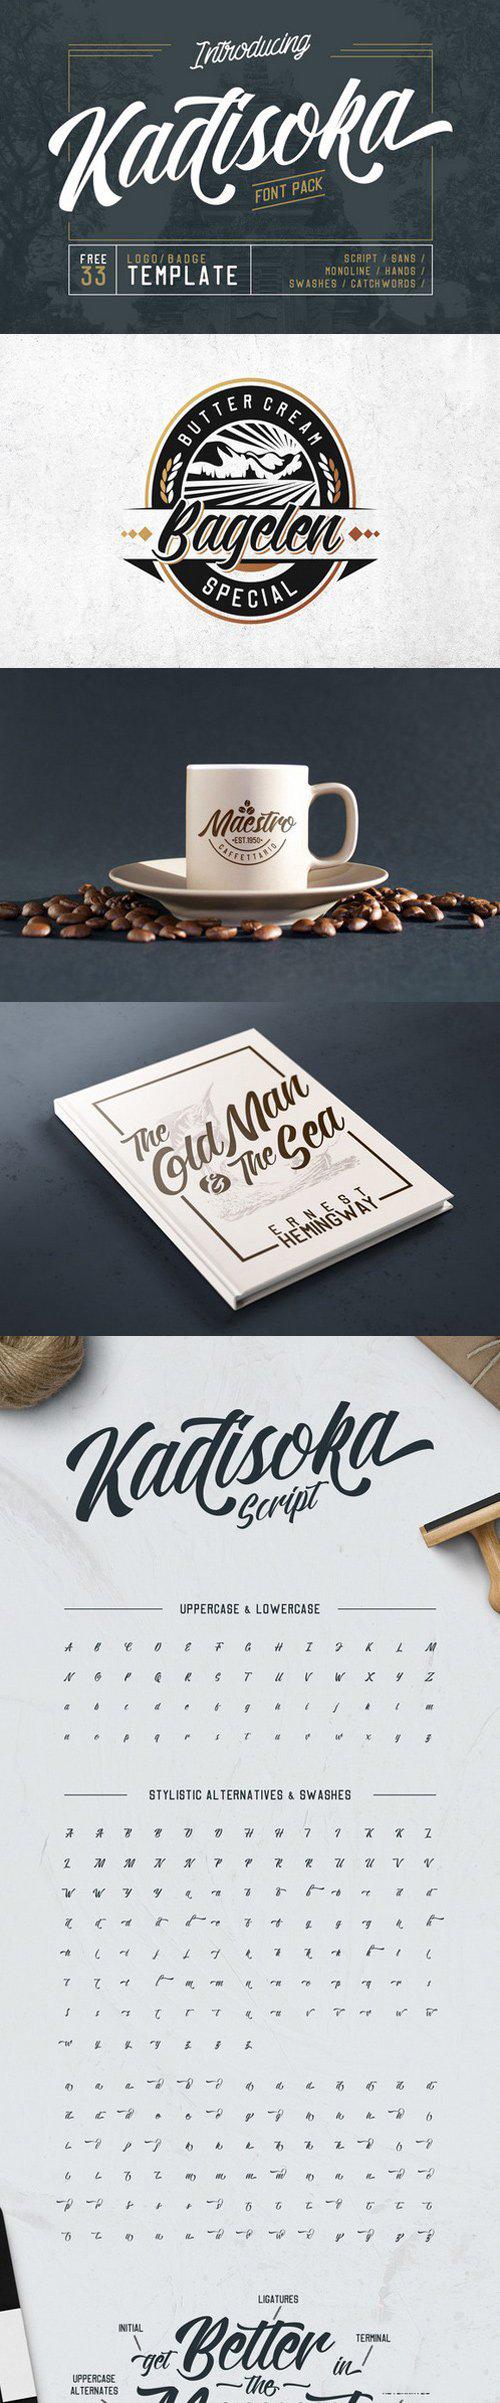 Kadisoka Font Pack